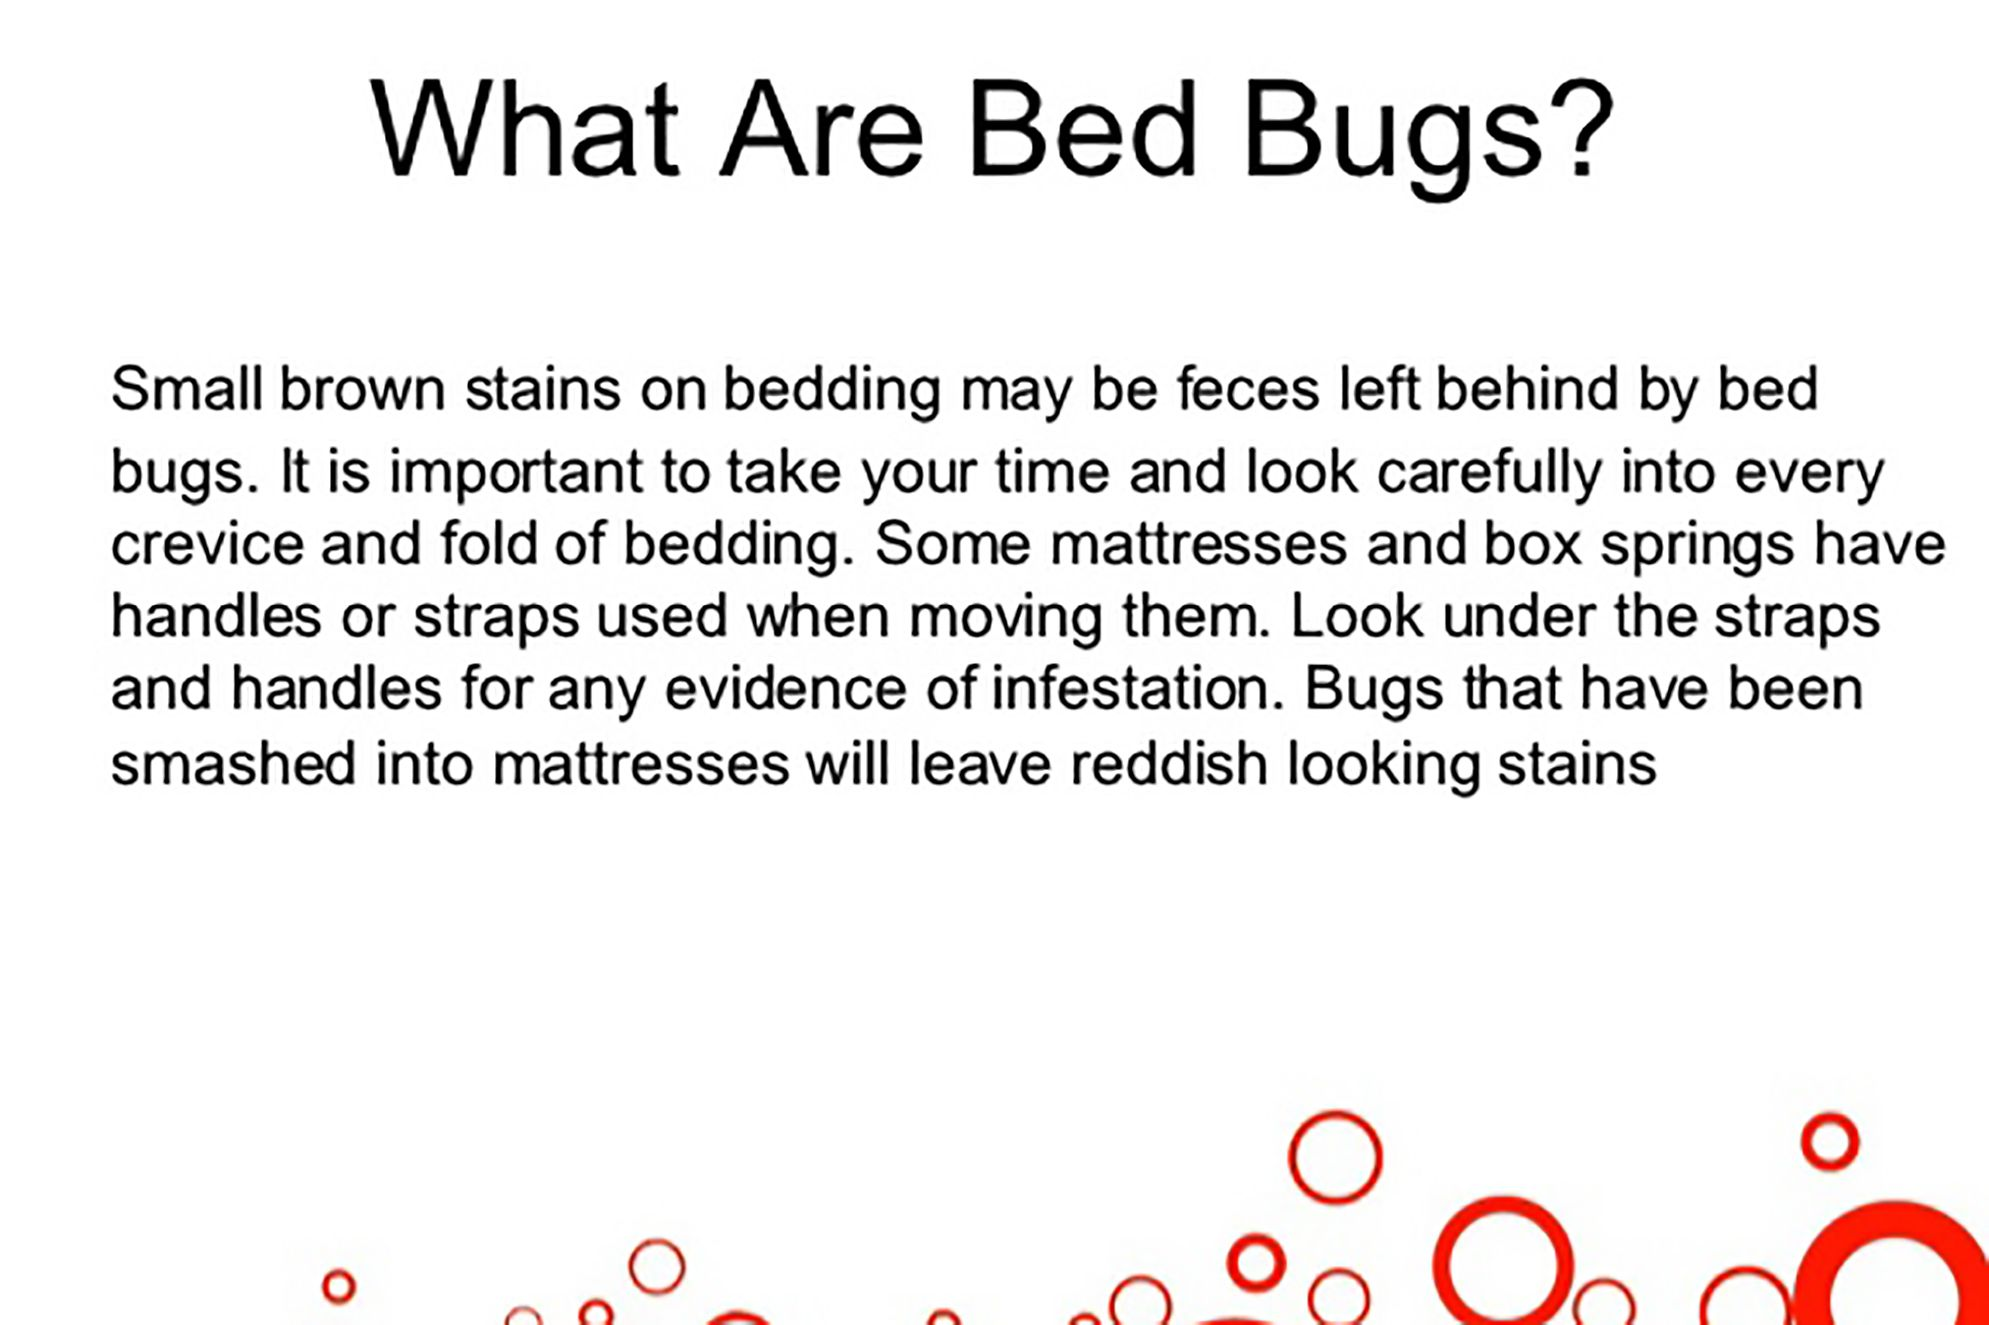 bedbugs killbedbugs Bed bugs, Kill bed bugs, Box spring